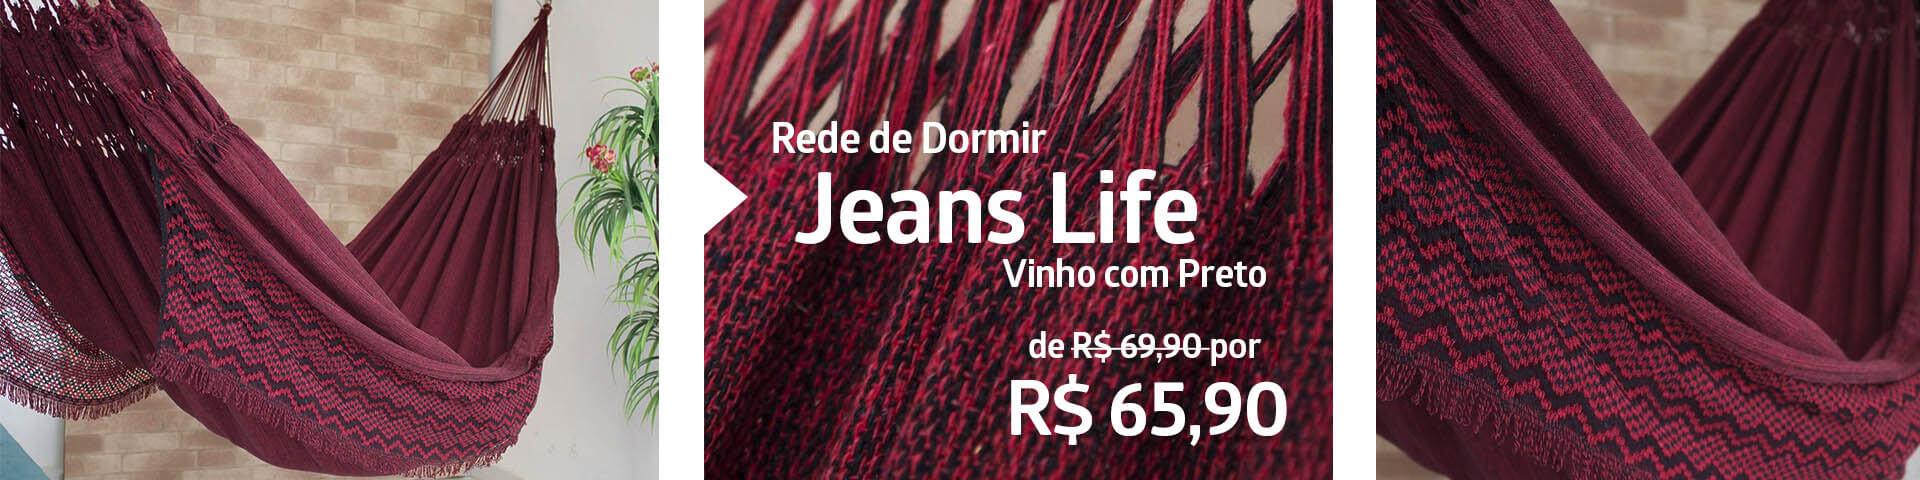 Jeans Life Vinho